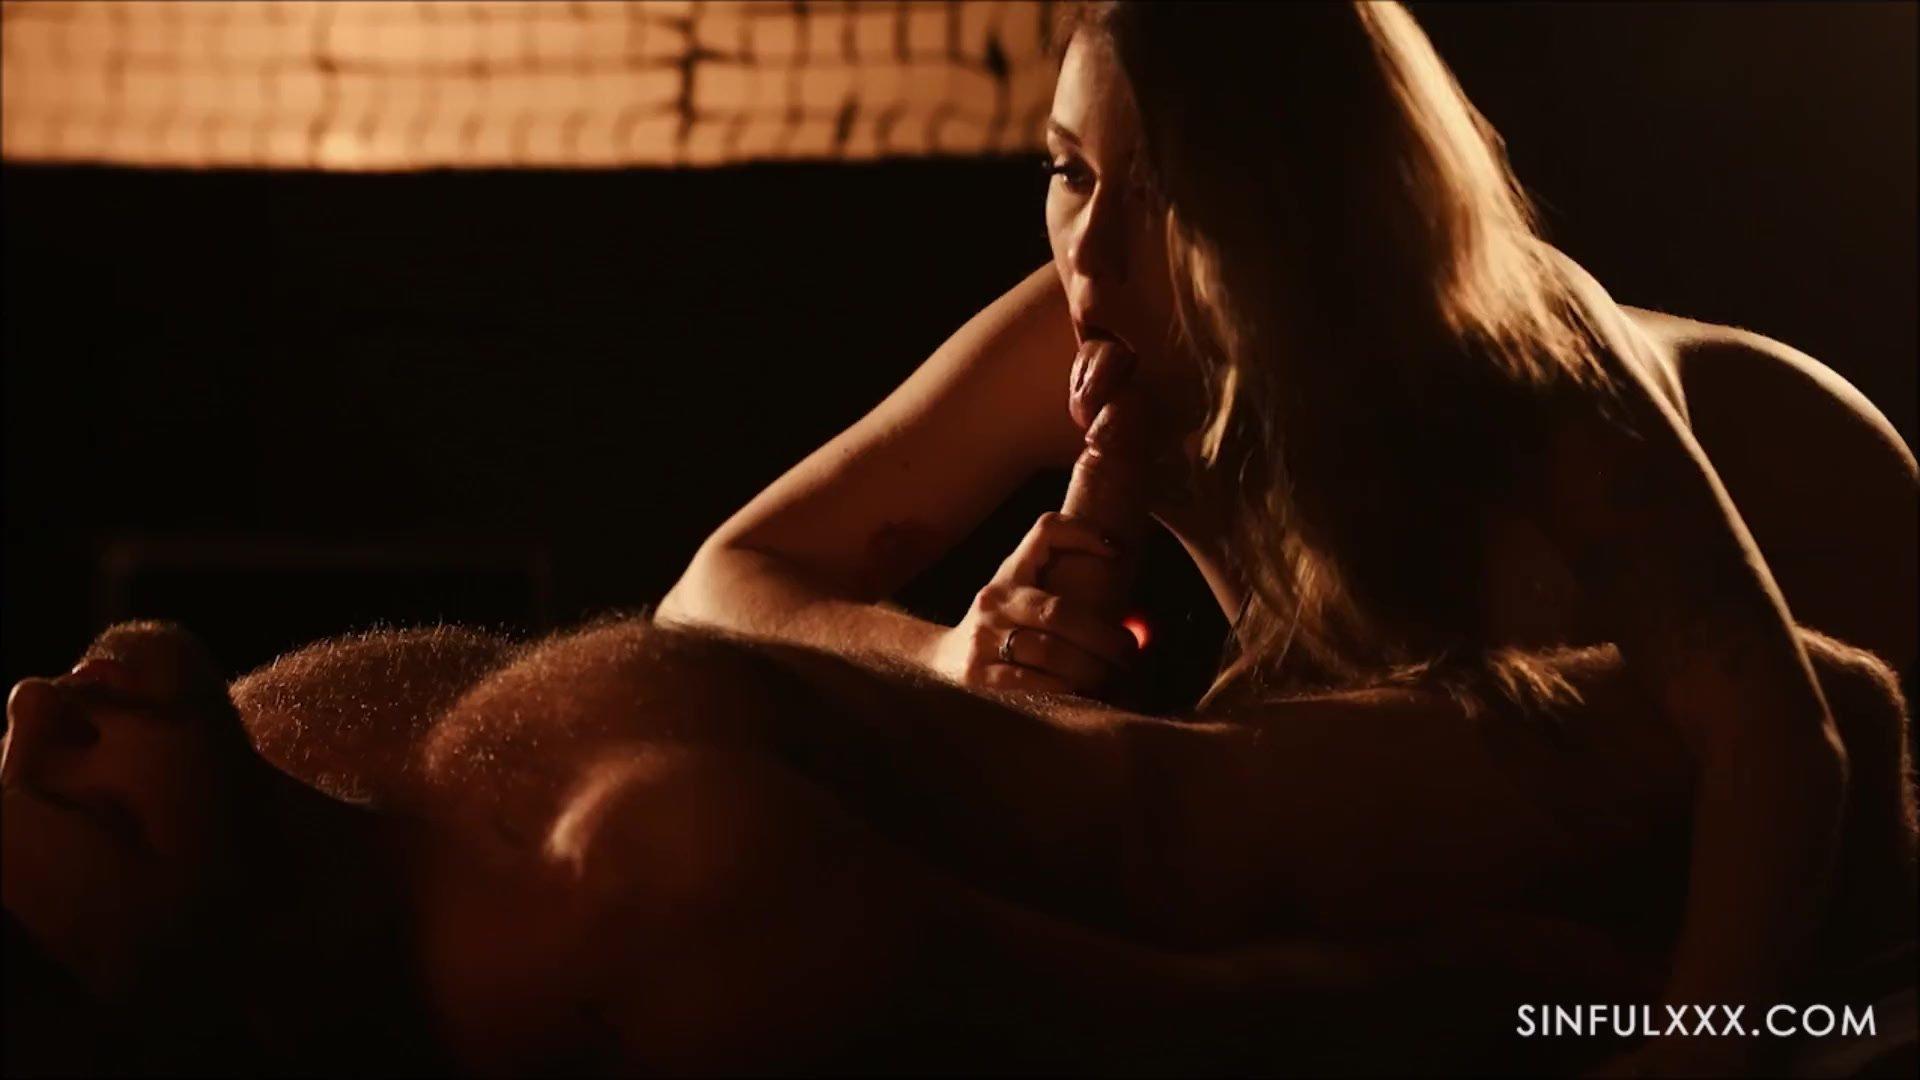 Misha Cross meets the artist for sex